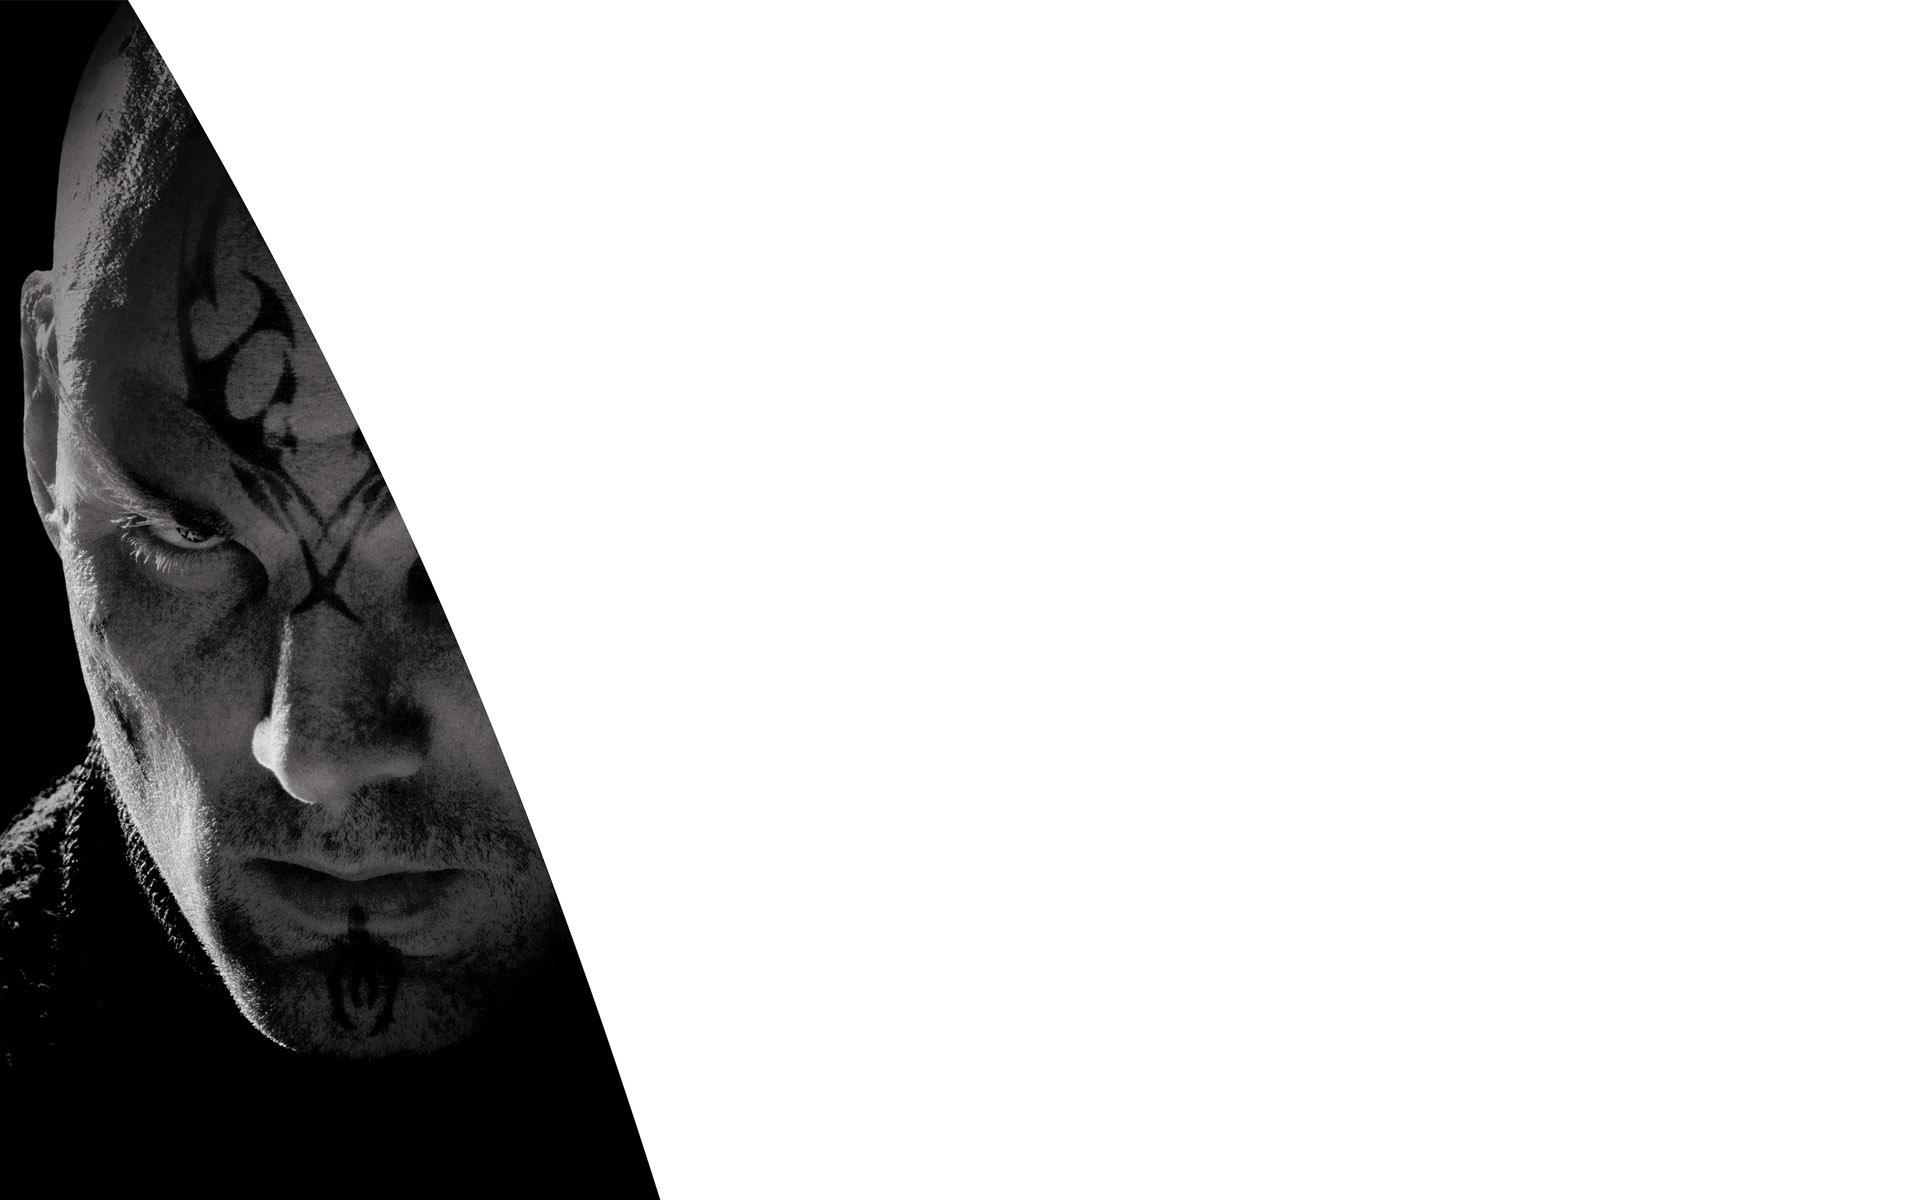 Unduh 600 Wallpaper Black Nero HD Paling Baru